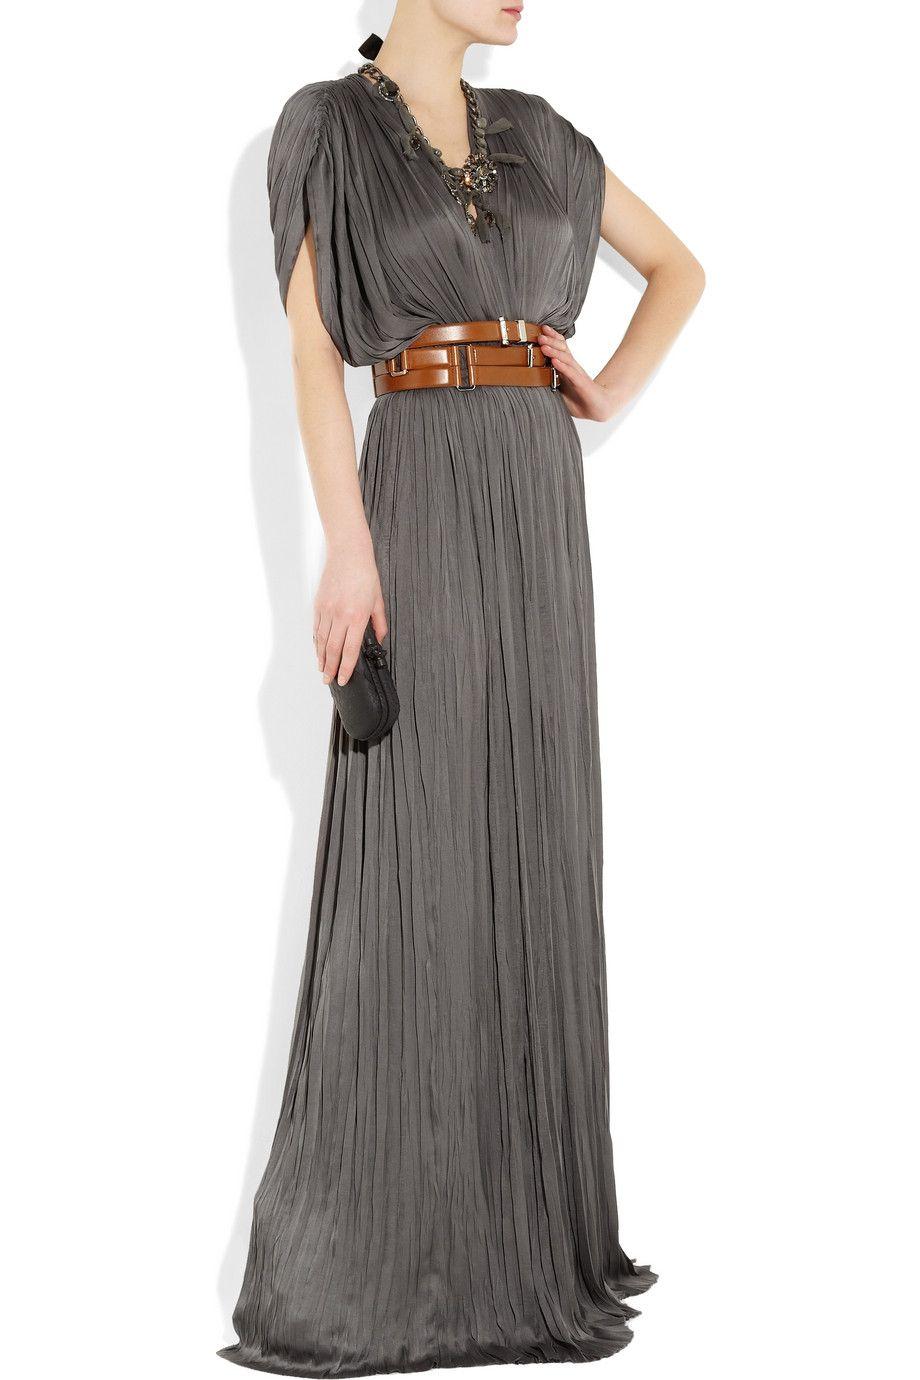 Lanvin maxi dress cinched with a michael kors belteek